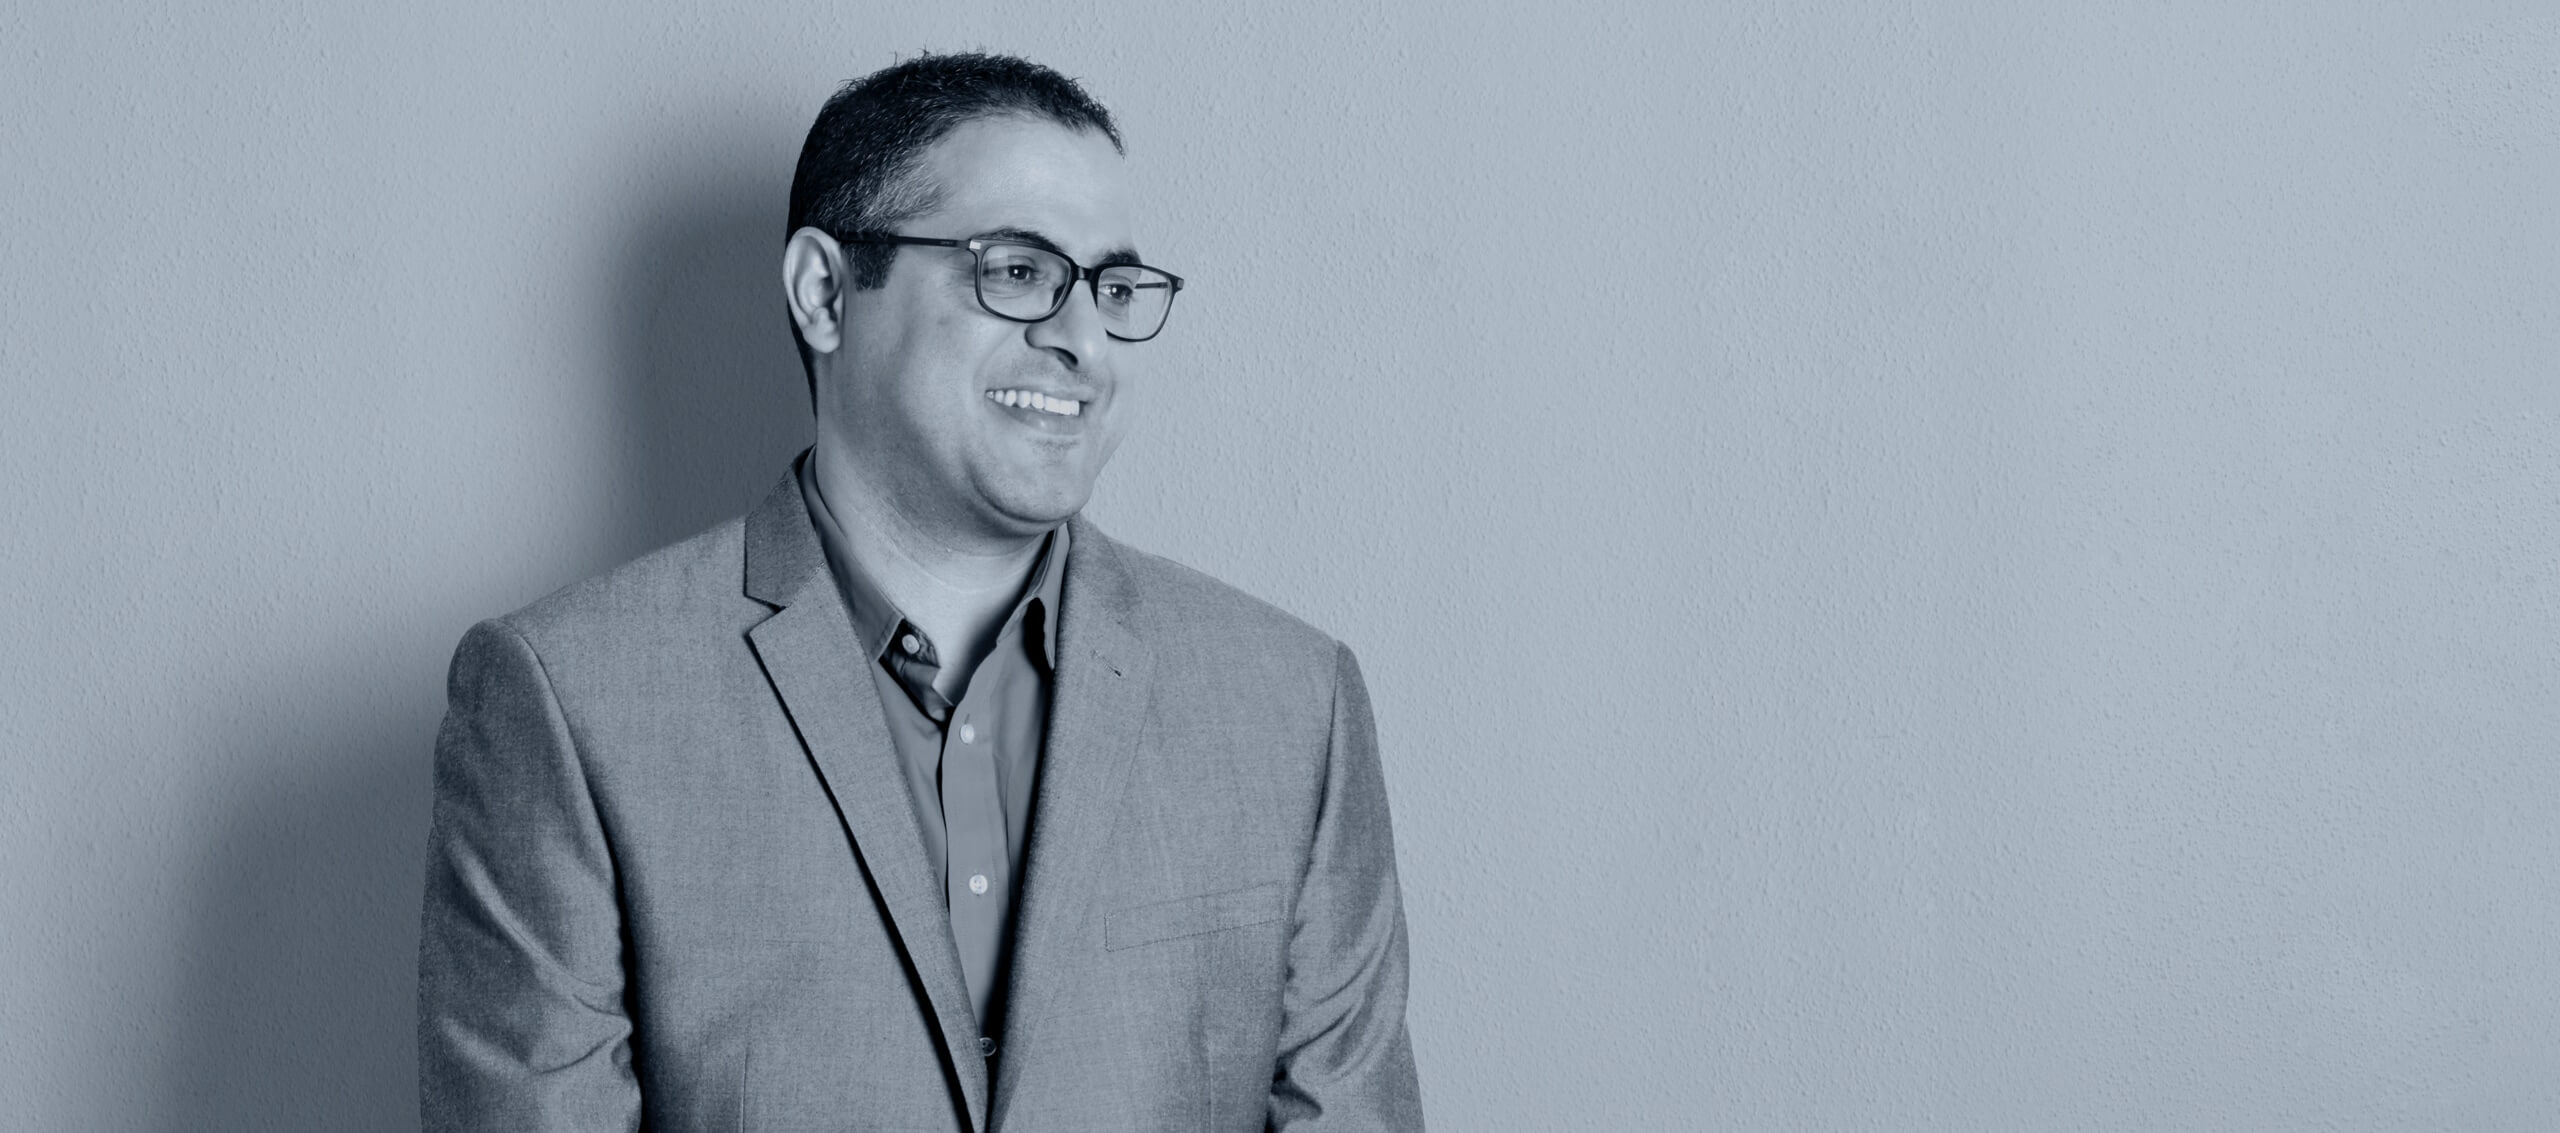 Janiv Ratson, Axonize's CEO